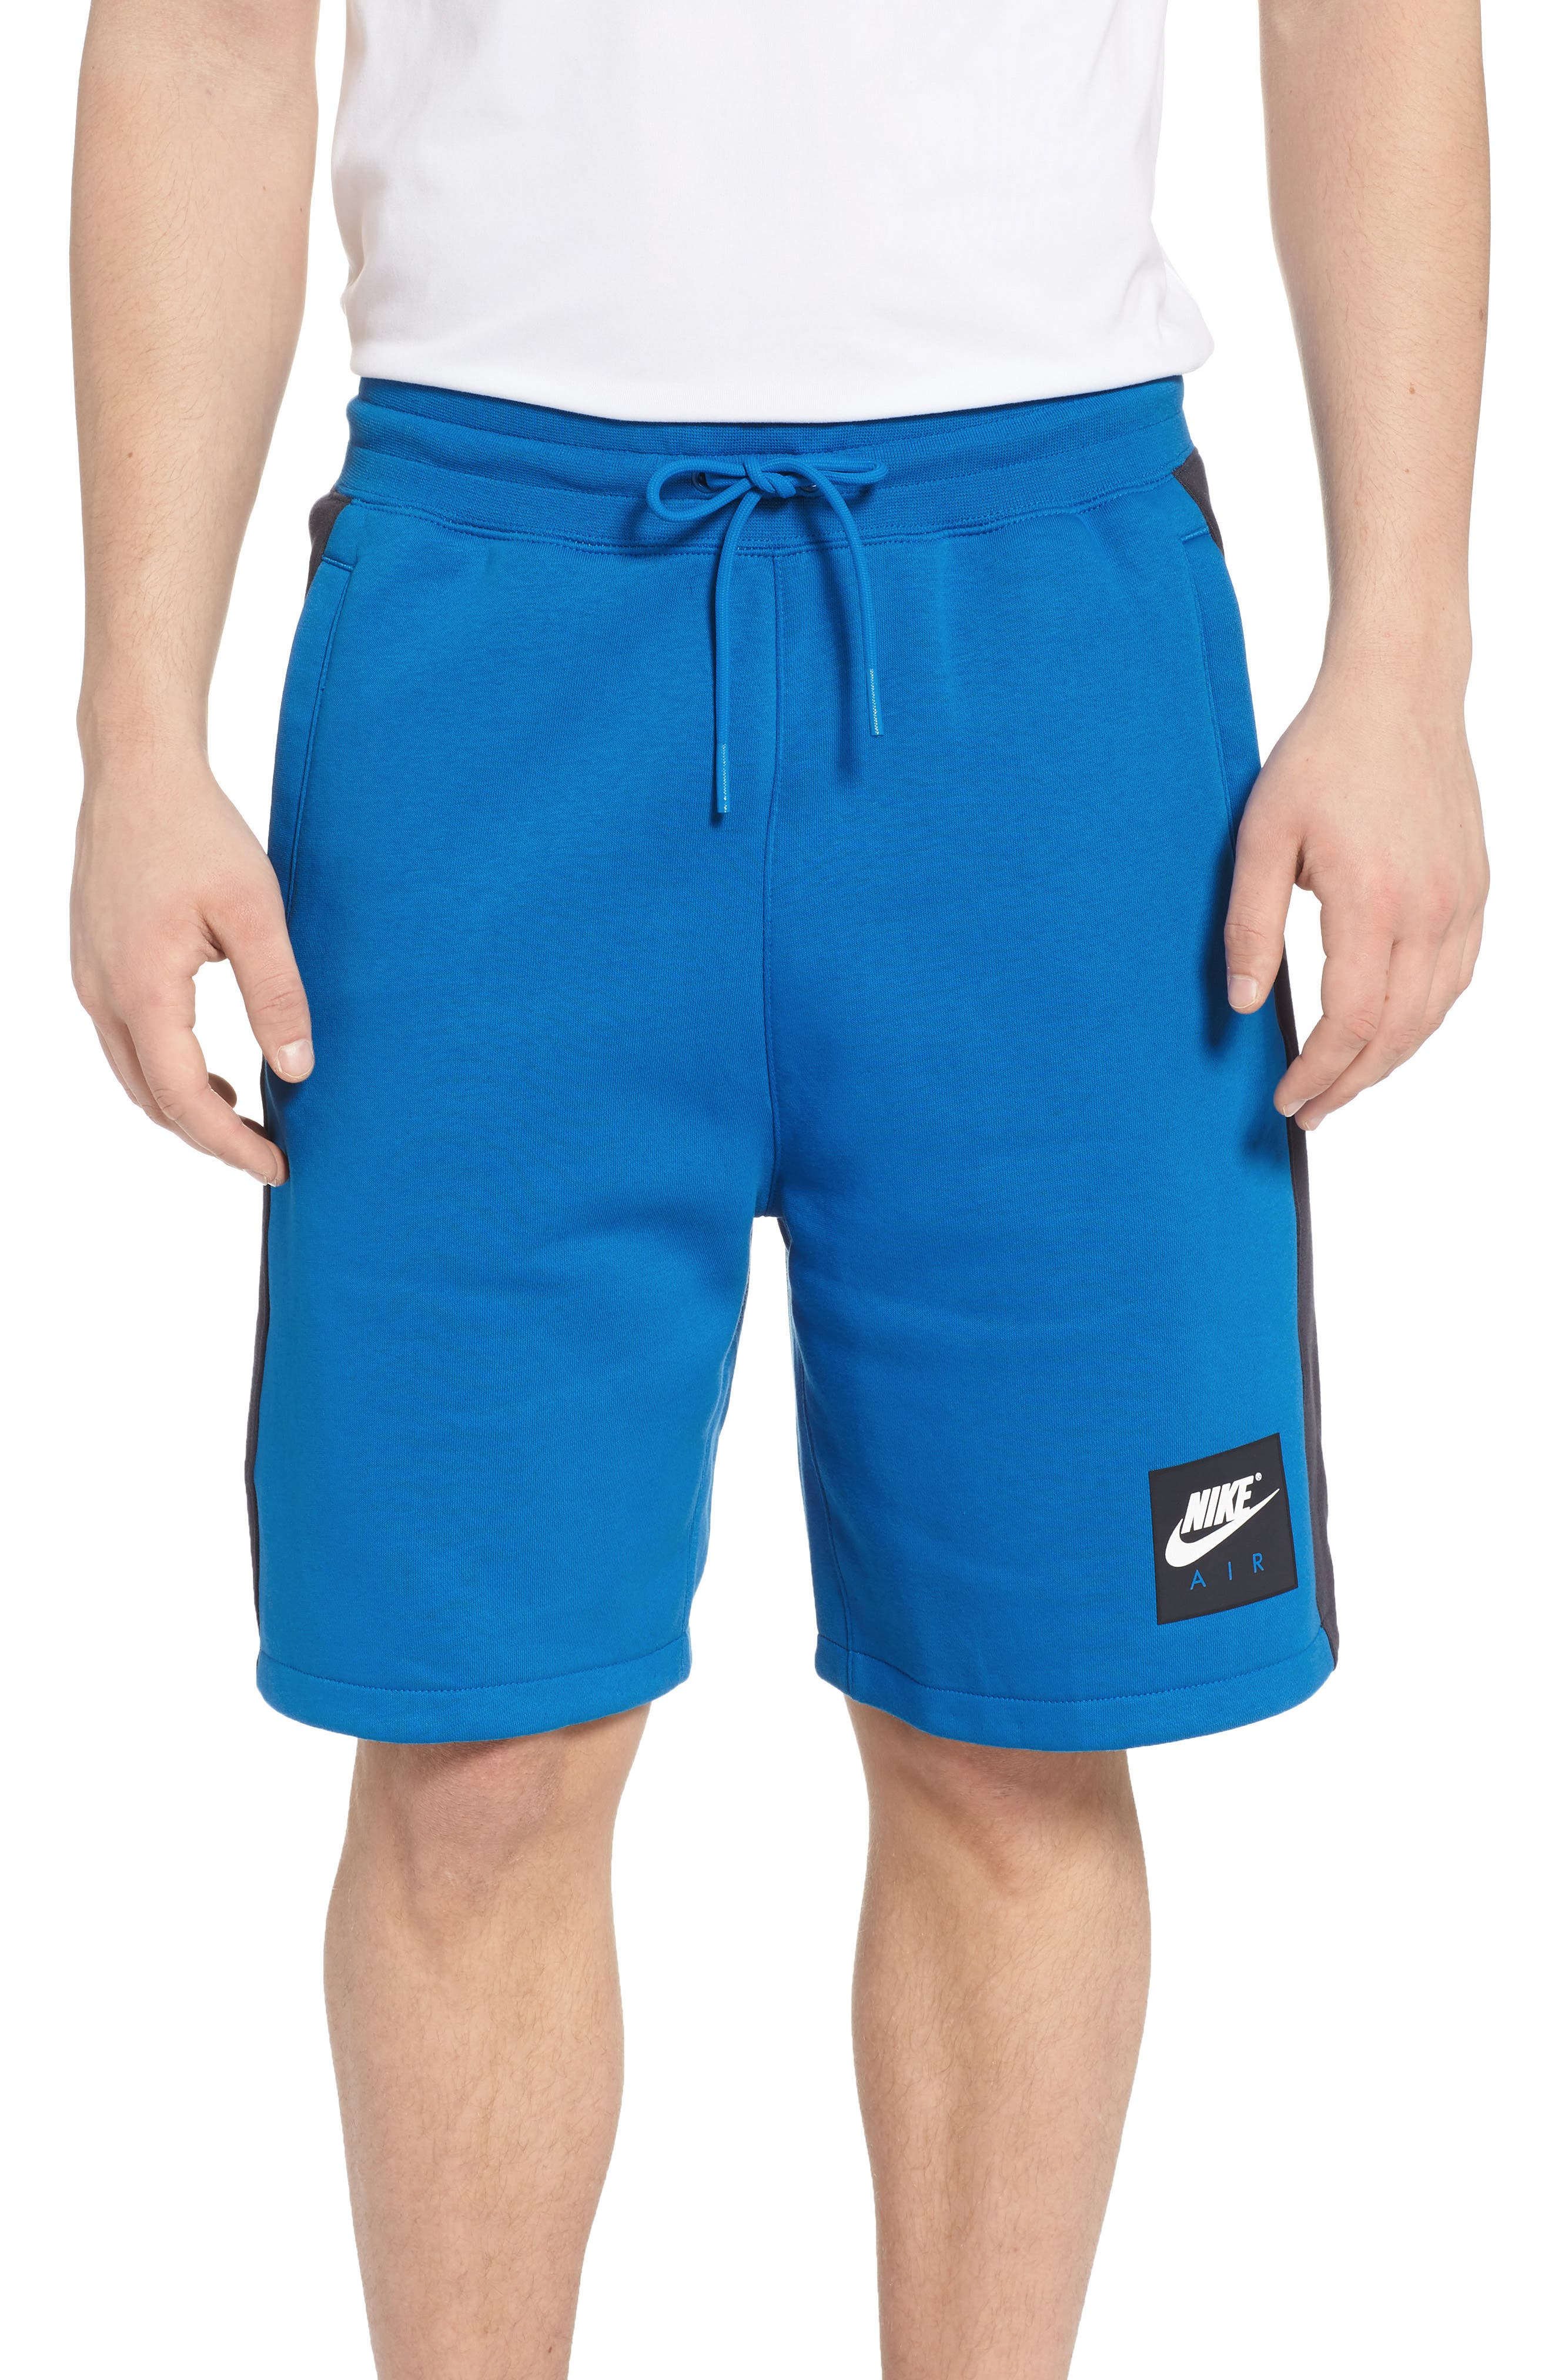 Sportswear Air Fleece Shorts,                         Main,                         color, Blue Nebula/ Anthracite/ White